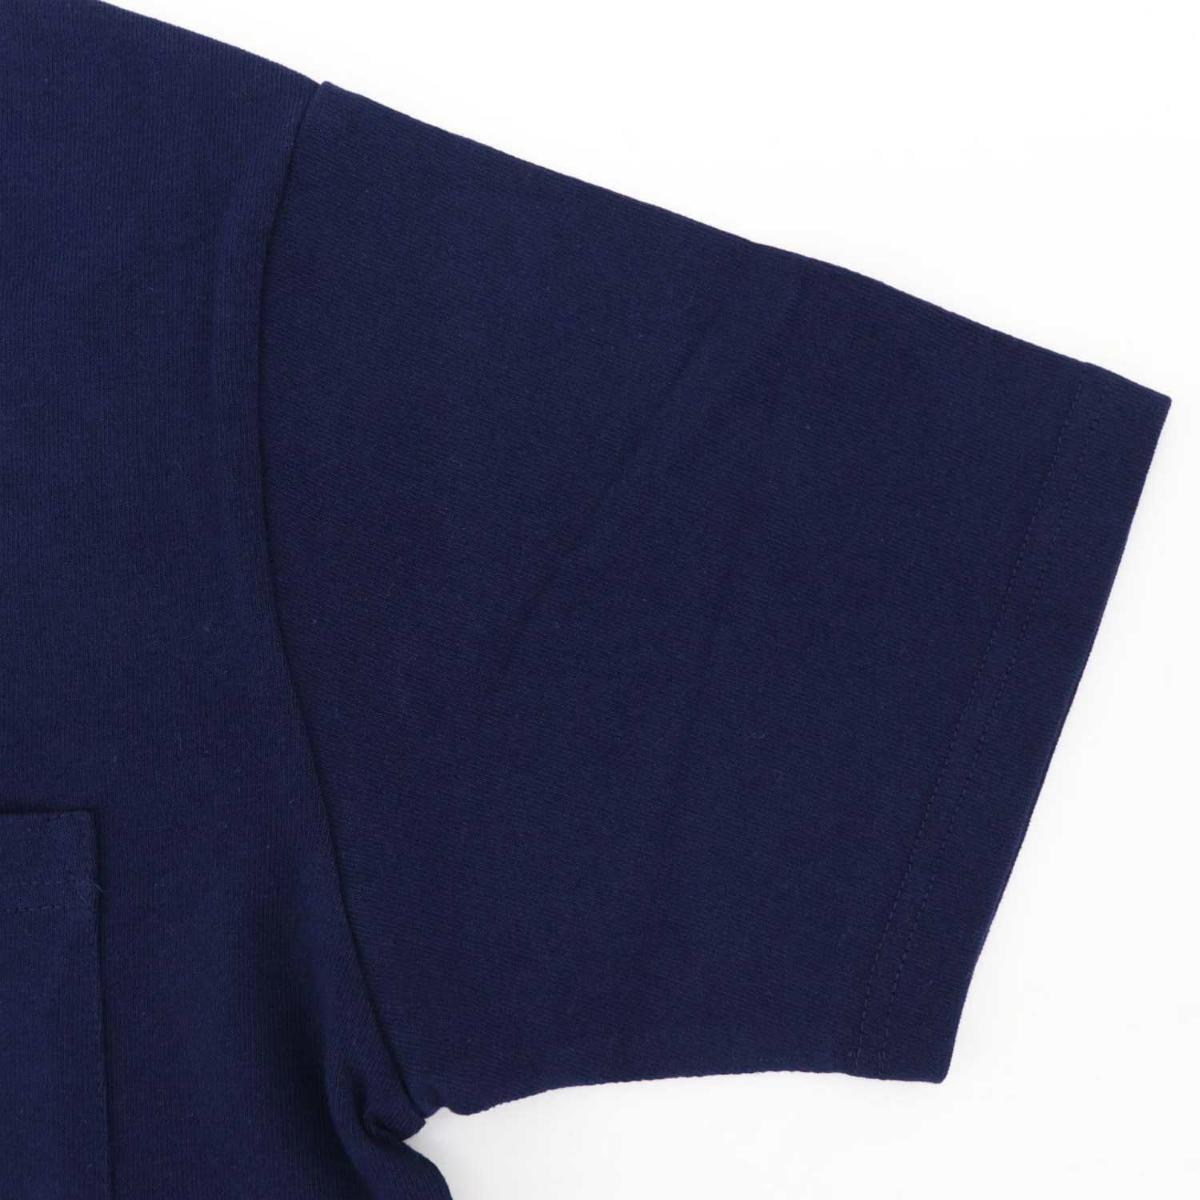 USAコットン クルーネック 半袖 Tシャツ NAVY(ネイビー)